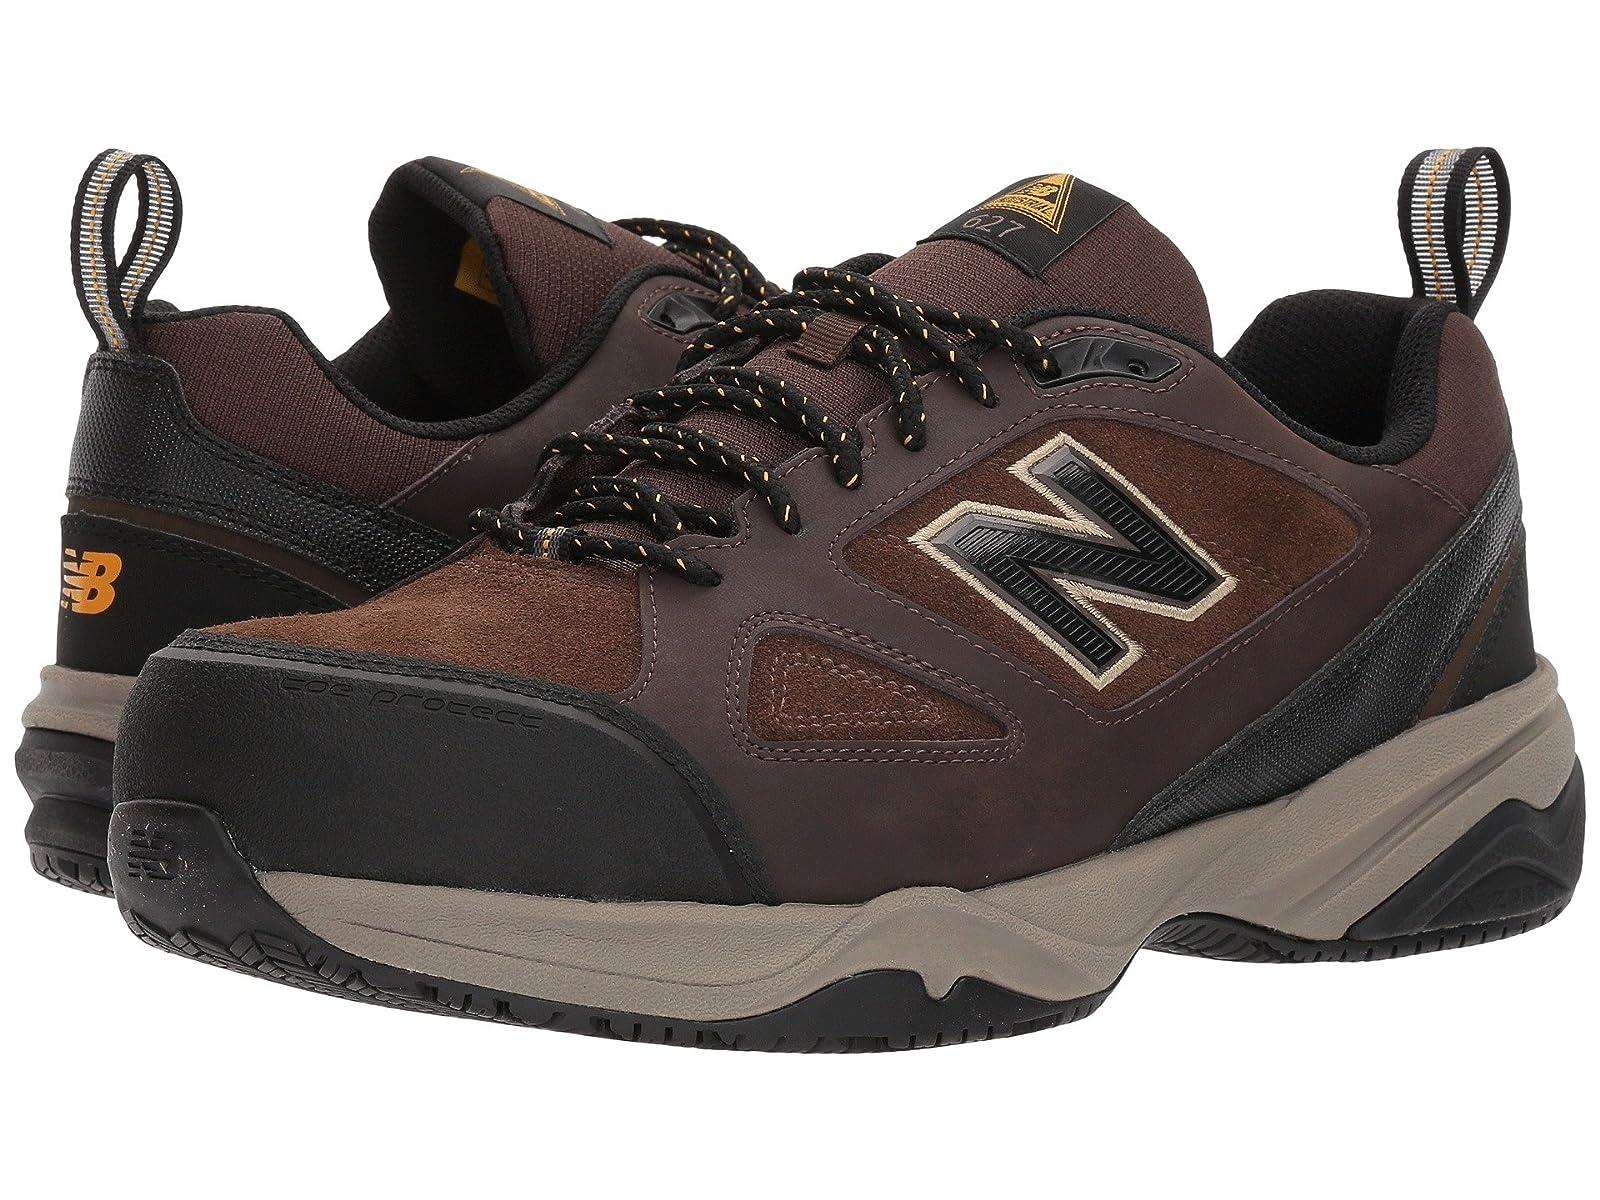 New Balance 627v2Atmospheric grades have affordable shoes